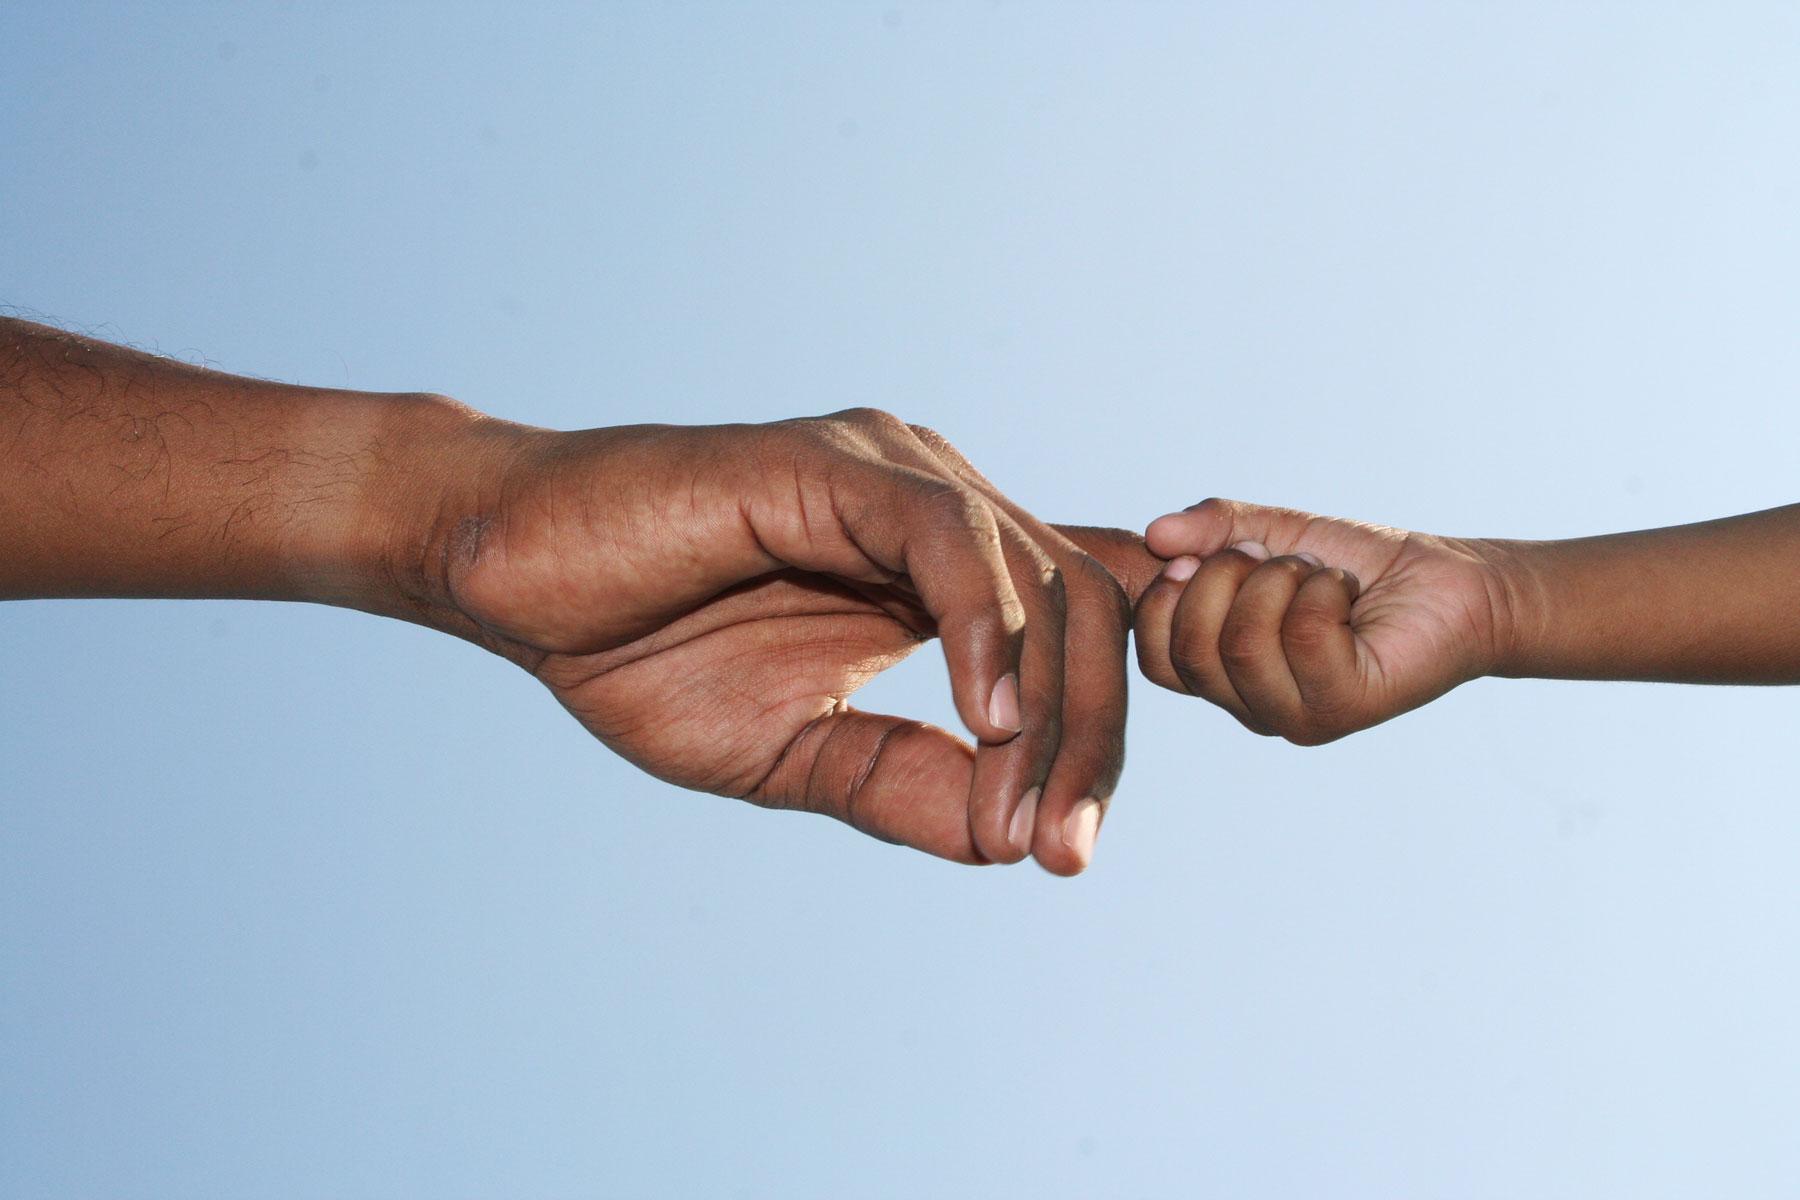 adult-child-hand-grasp